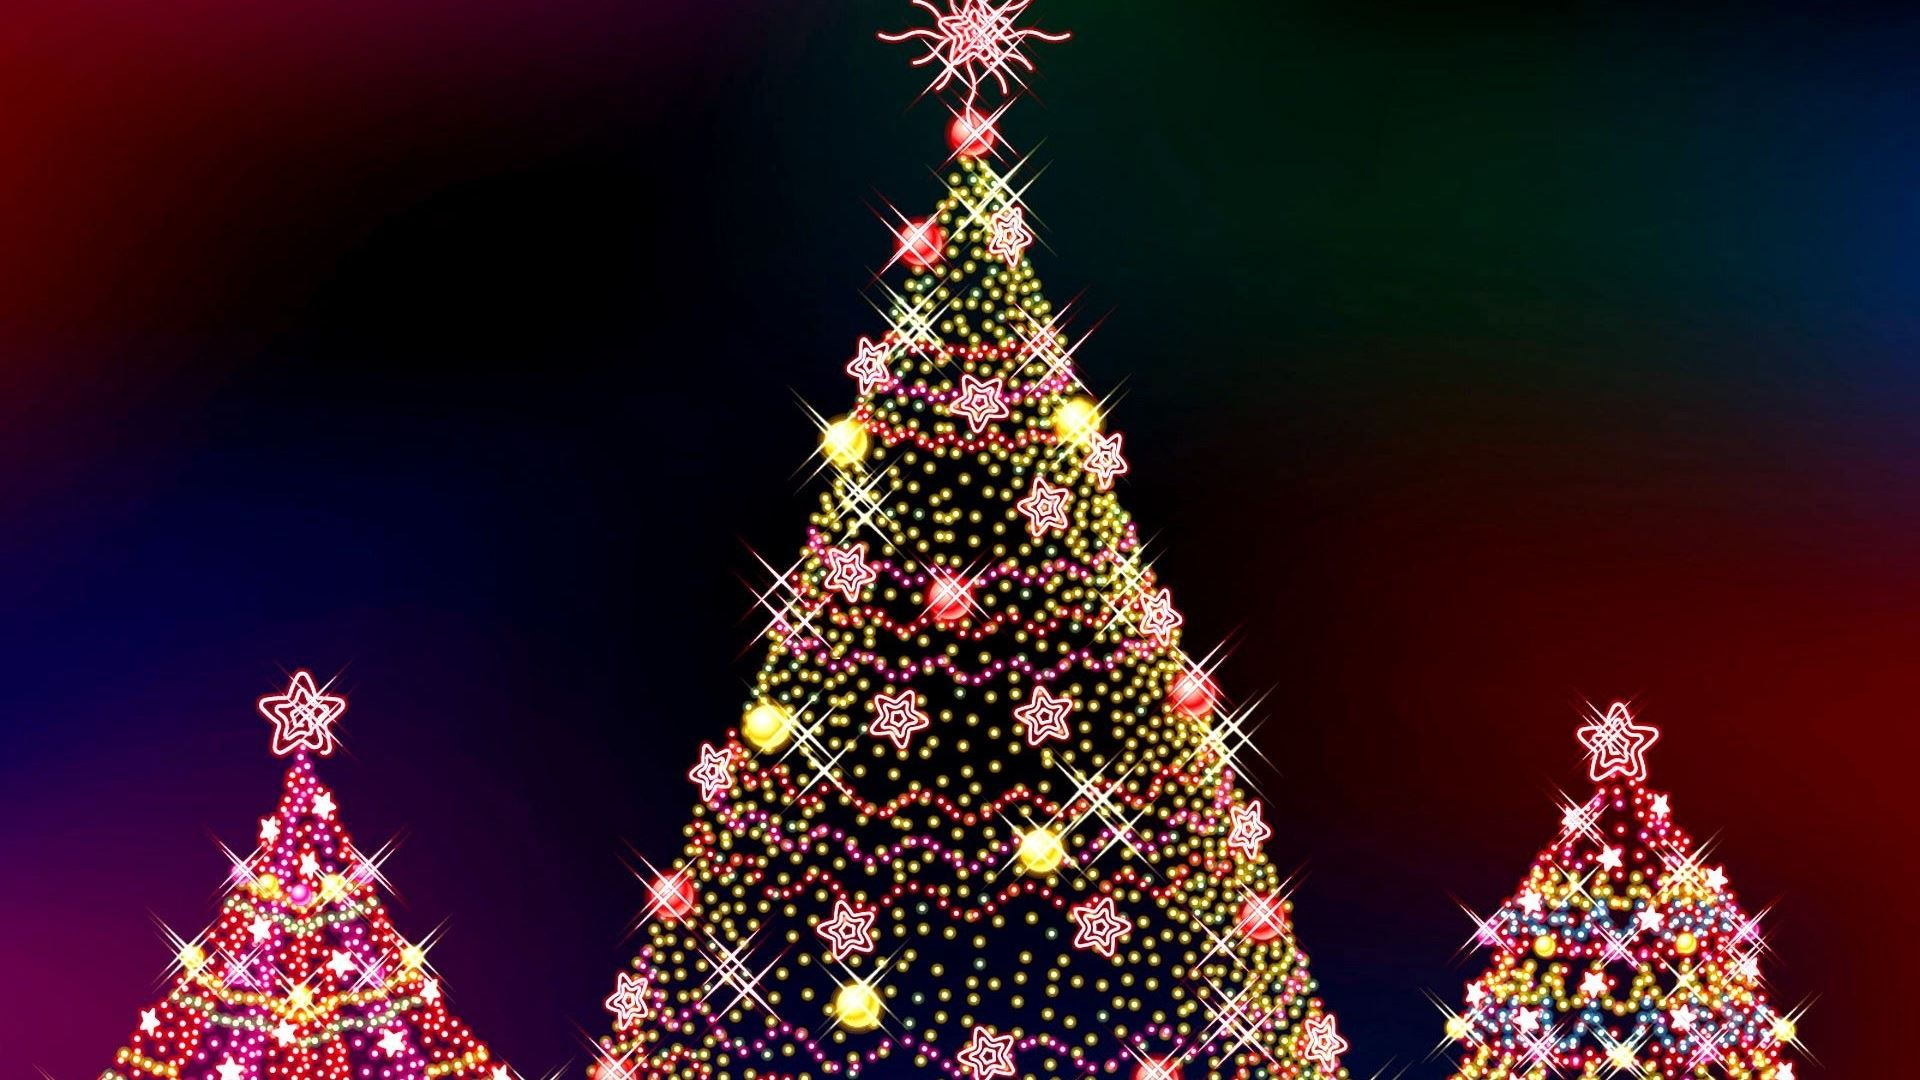 happy new year merry christmas mac wallpaper download free mac